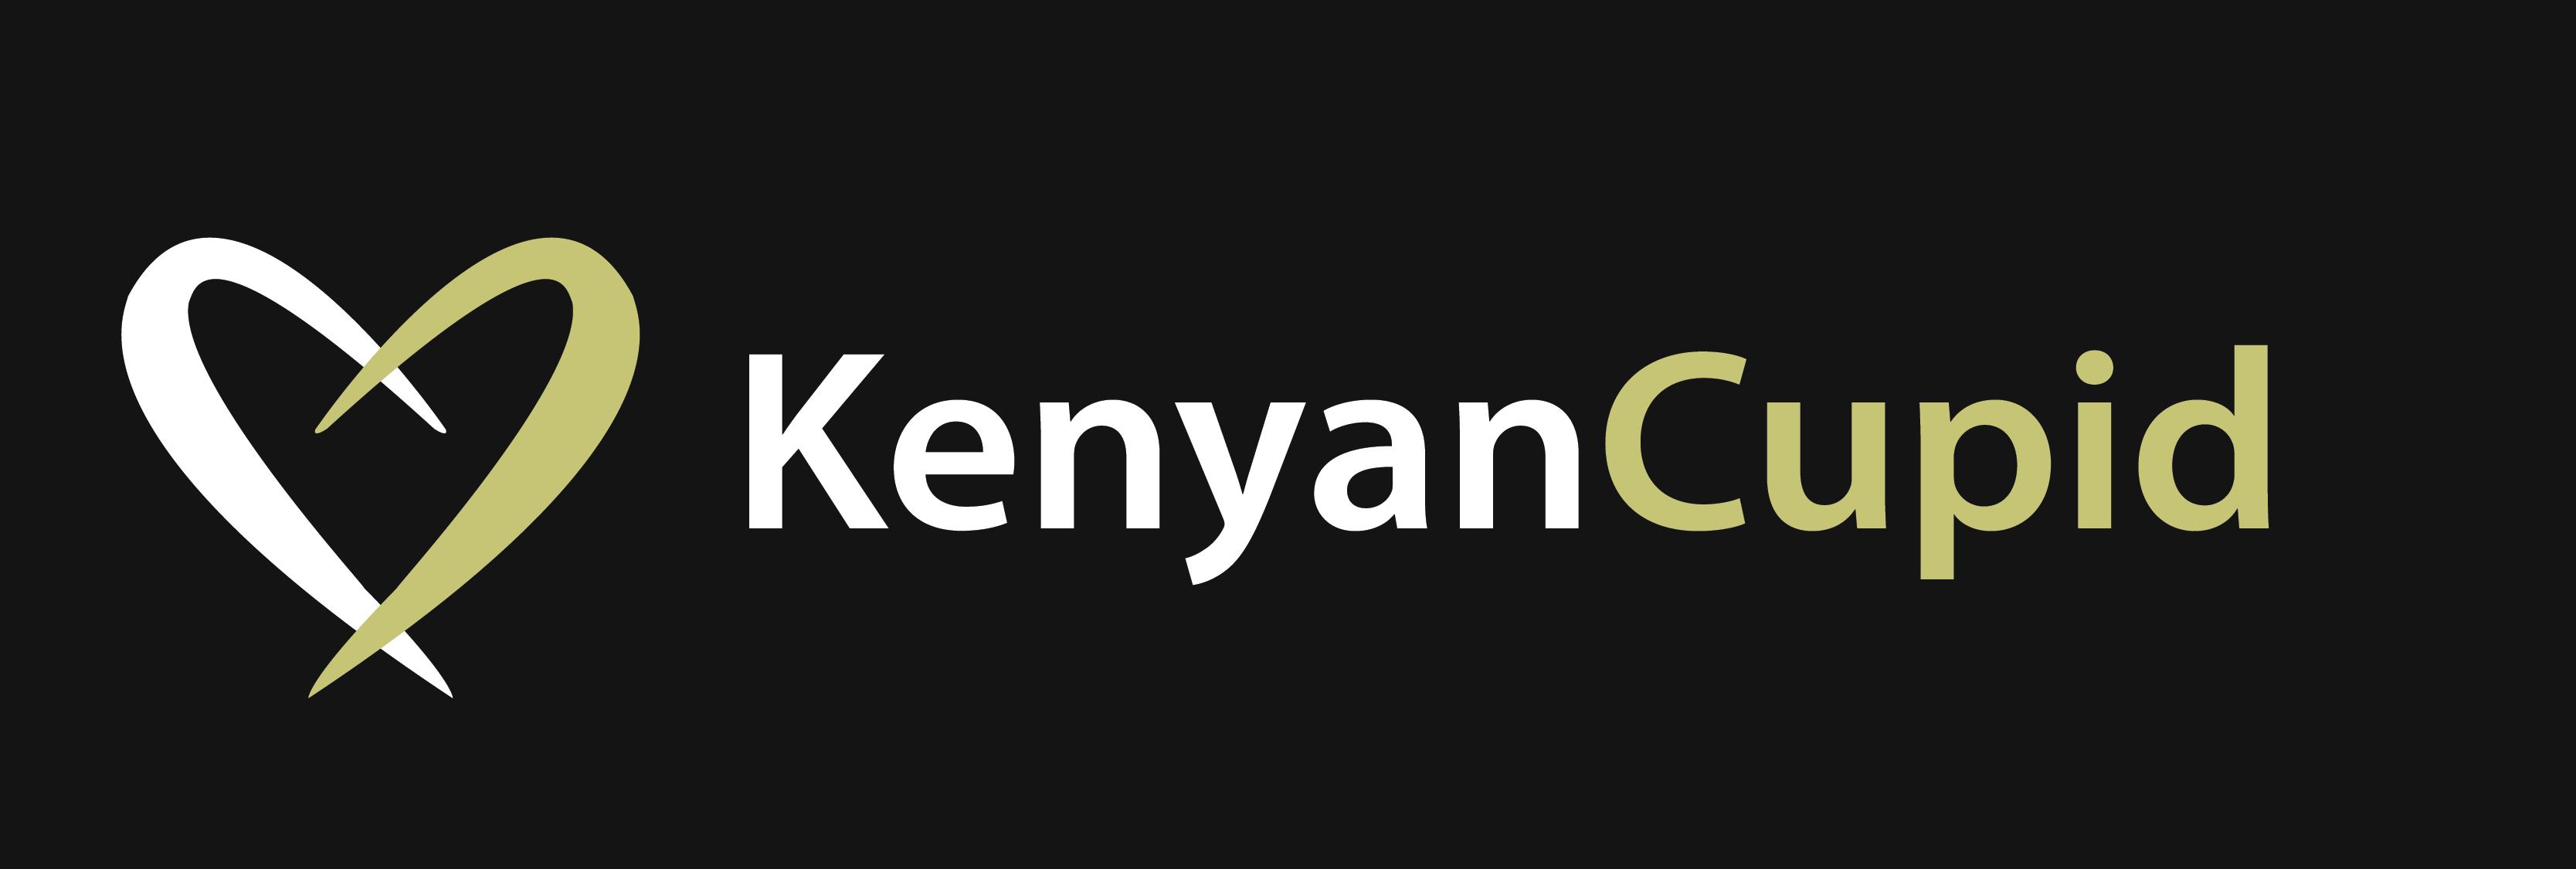 KenyanCupid im Test